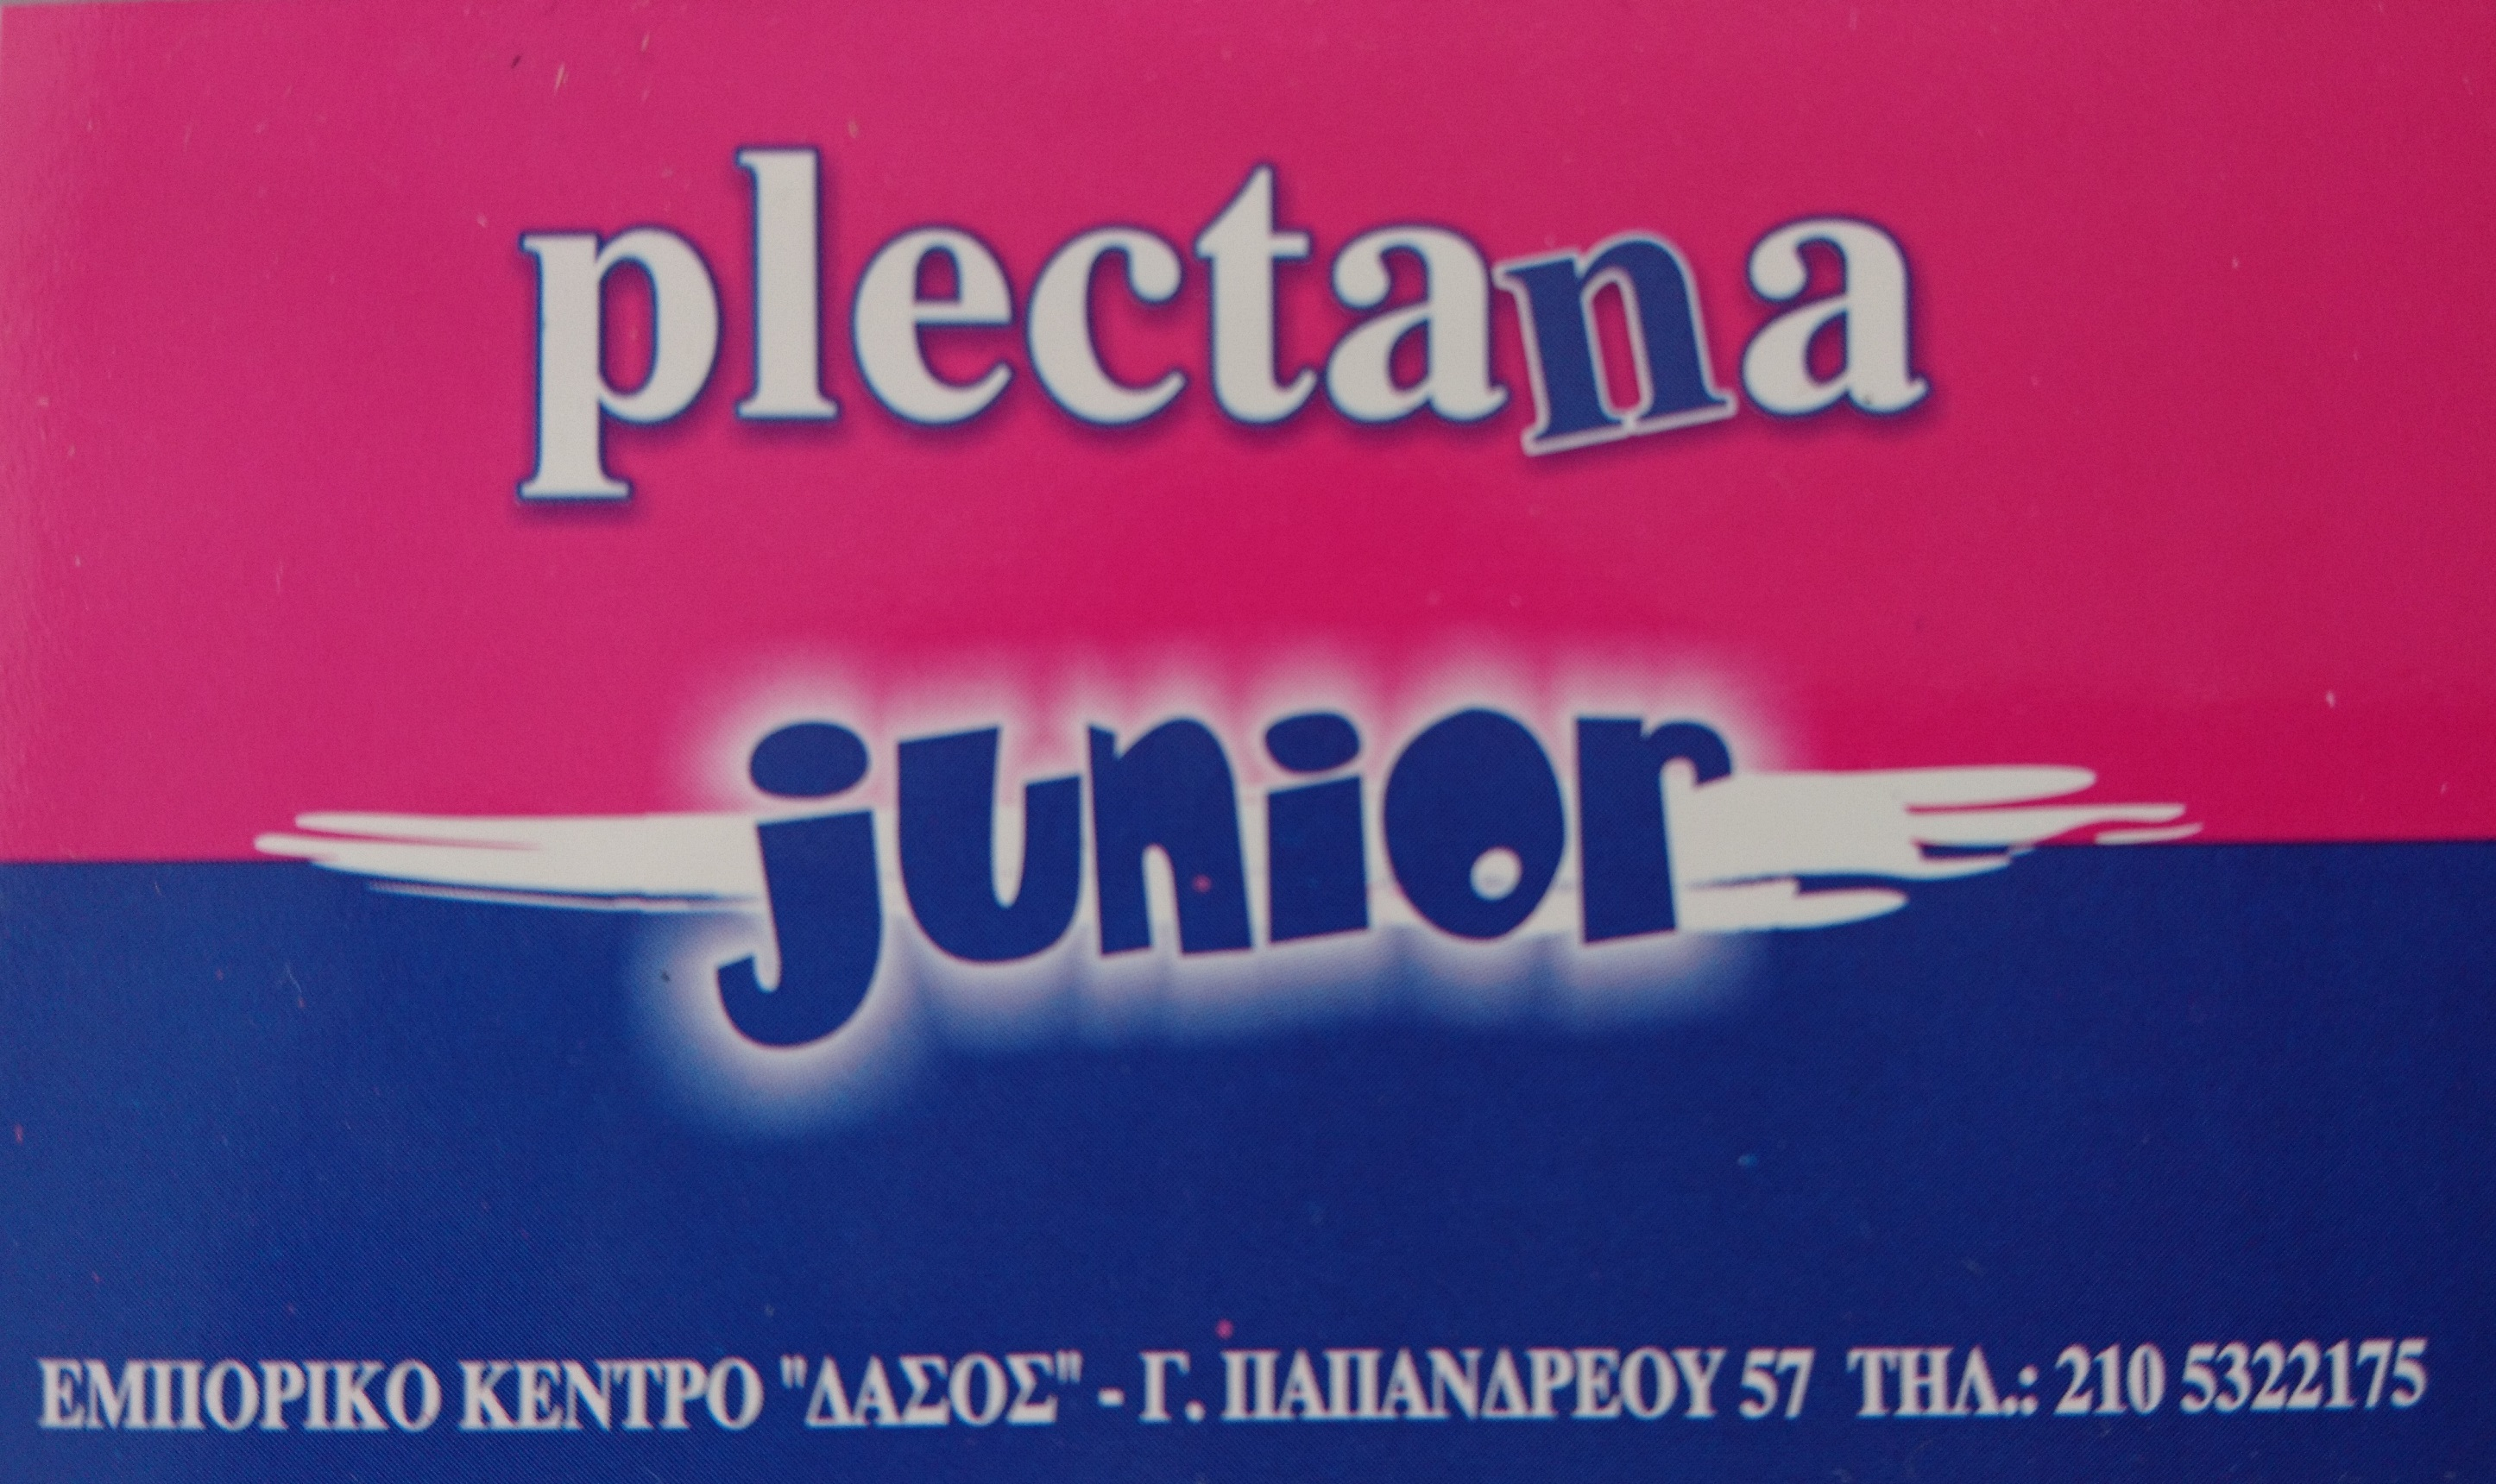 Plectana Junior